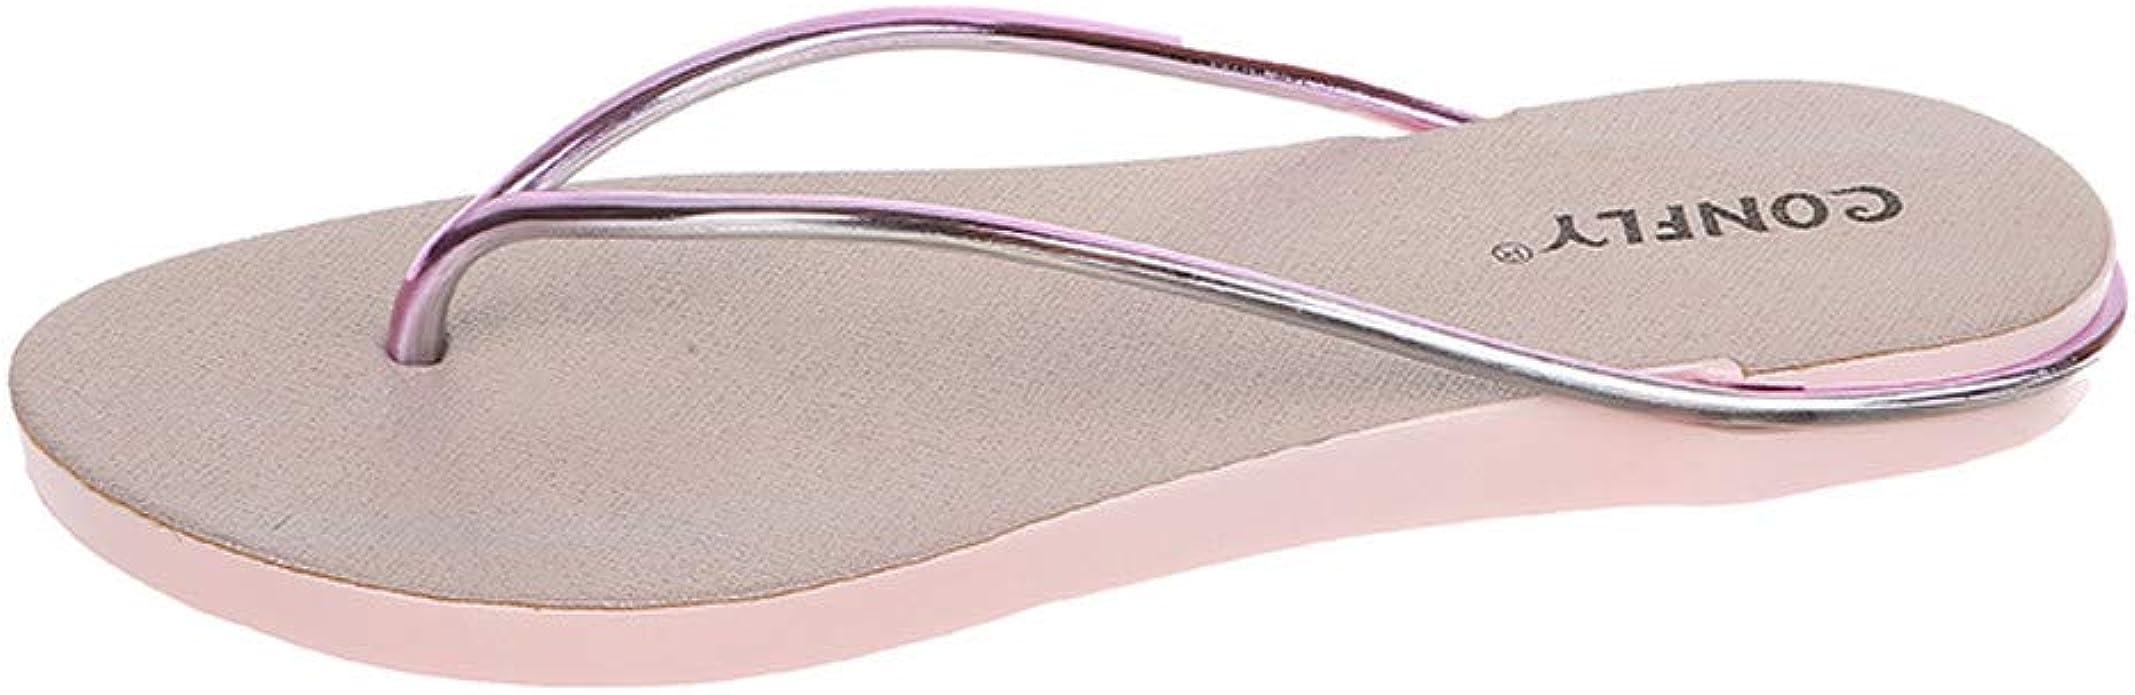 Women Ladies Summer Slippers